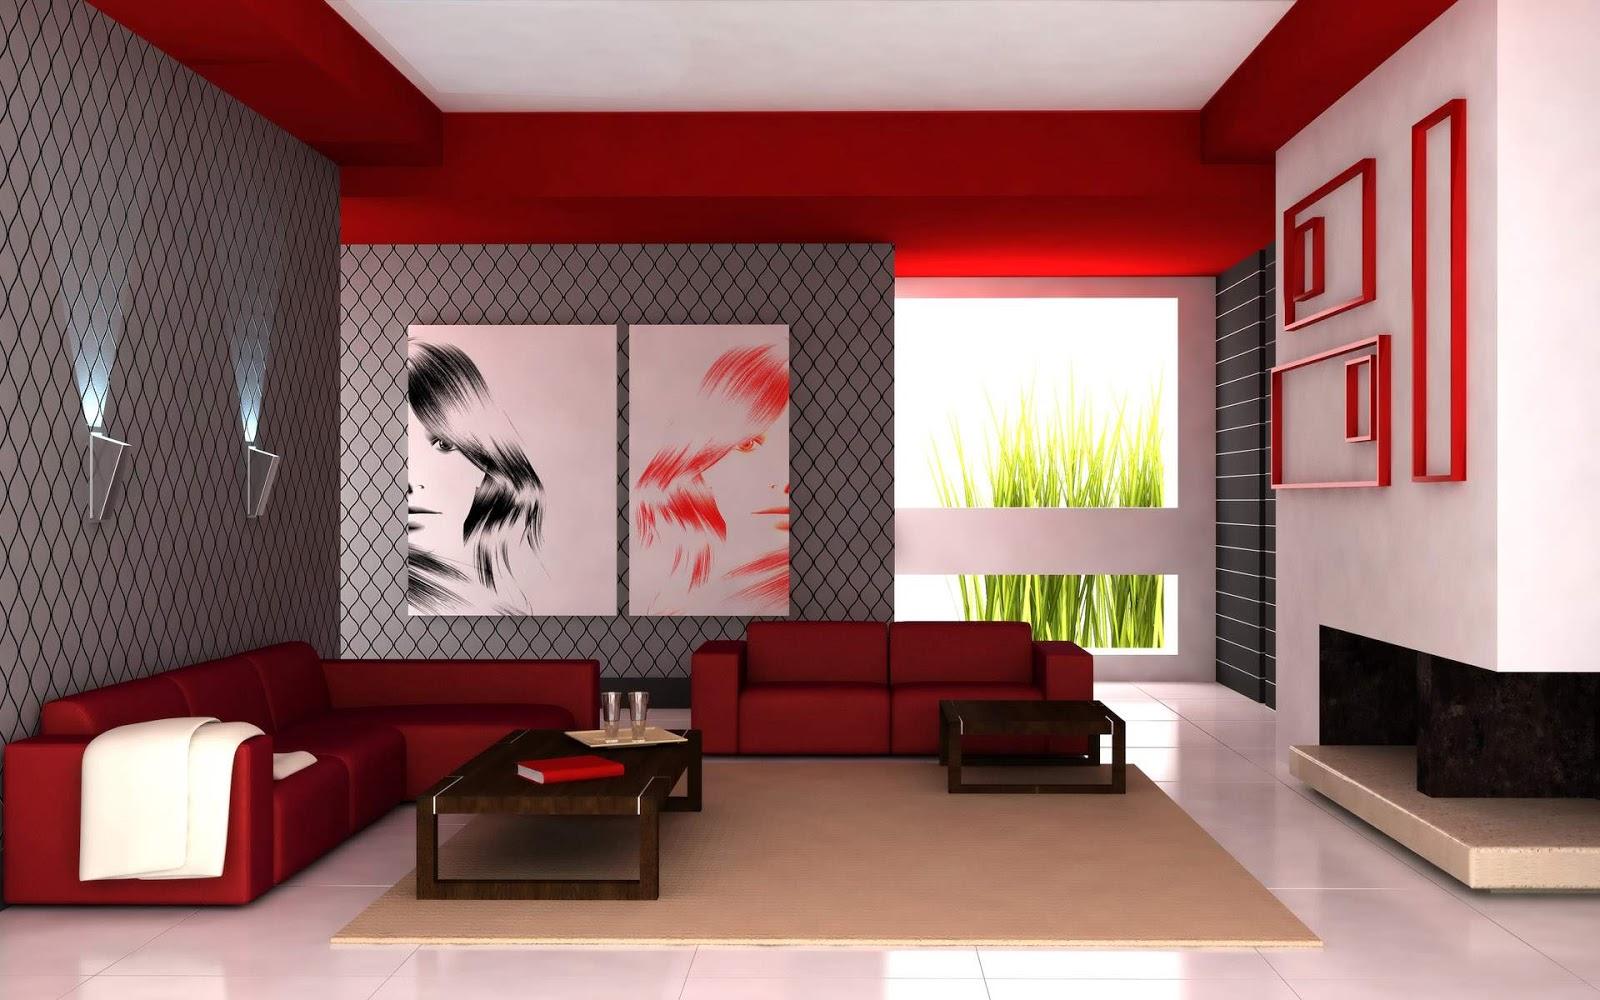 home decoration design modern and latest interior design trends for 2012 pictures. Black Bedroom Furniture Sets. Home Design Ideas